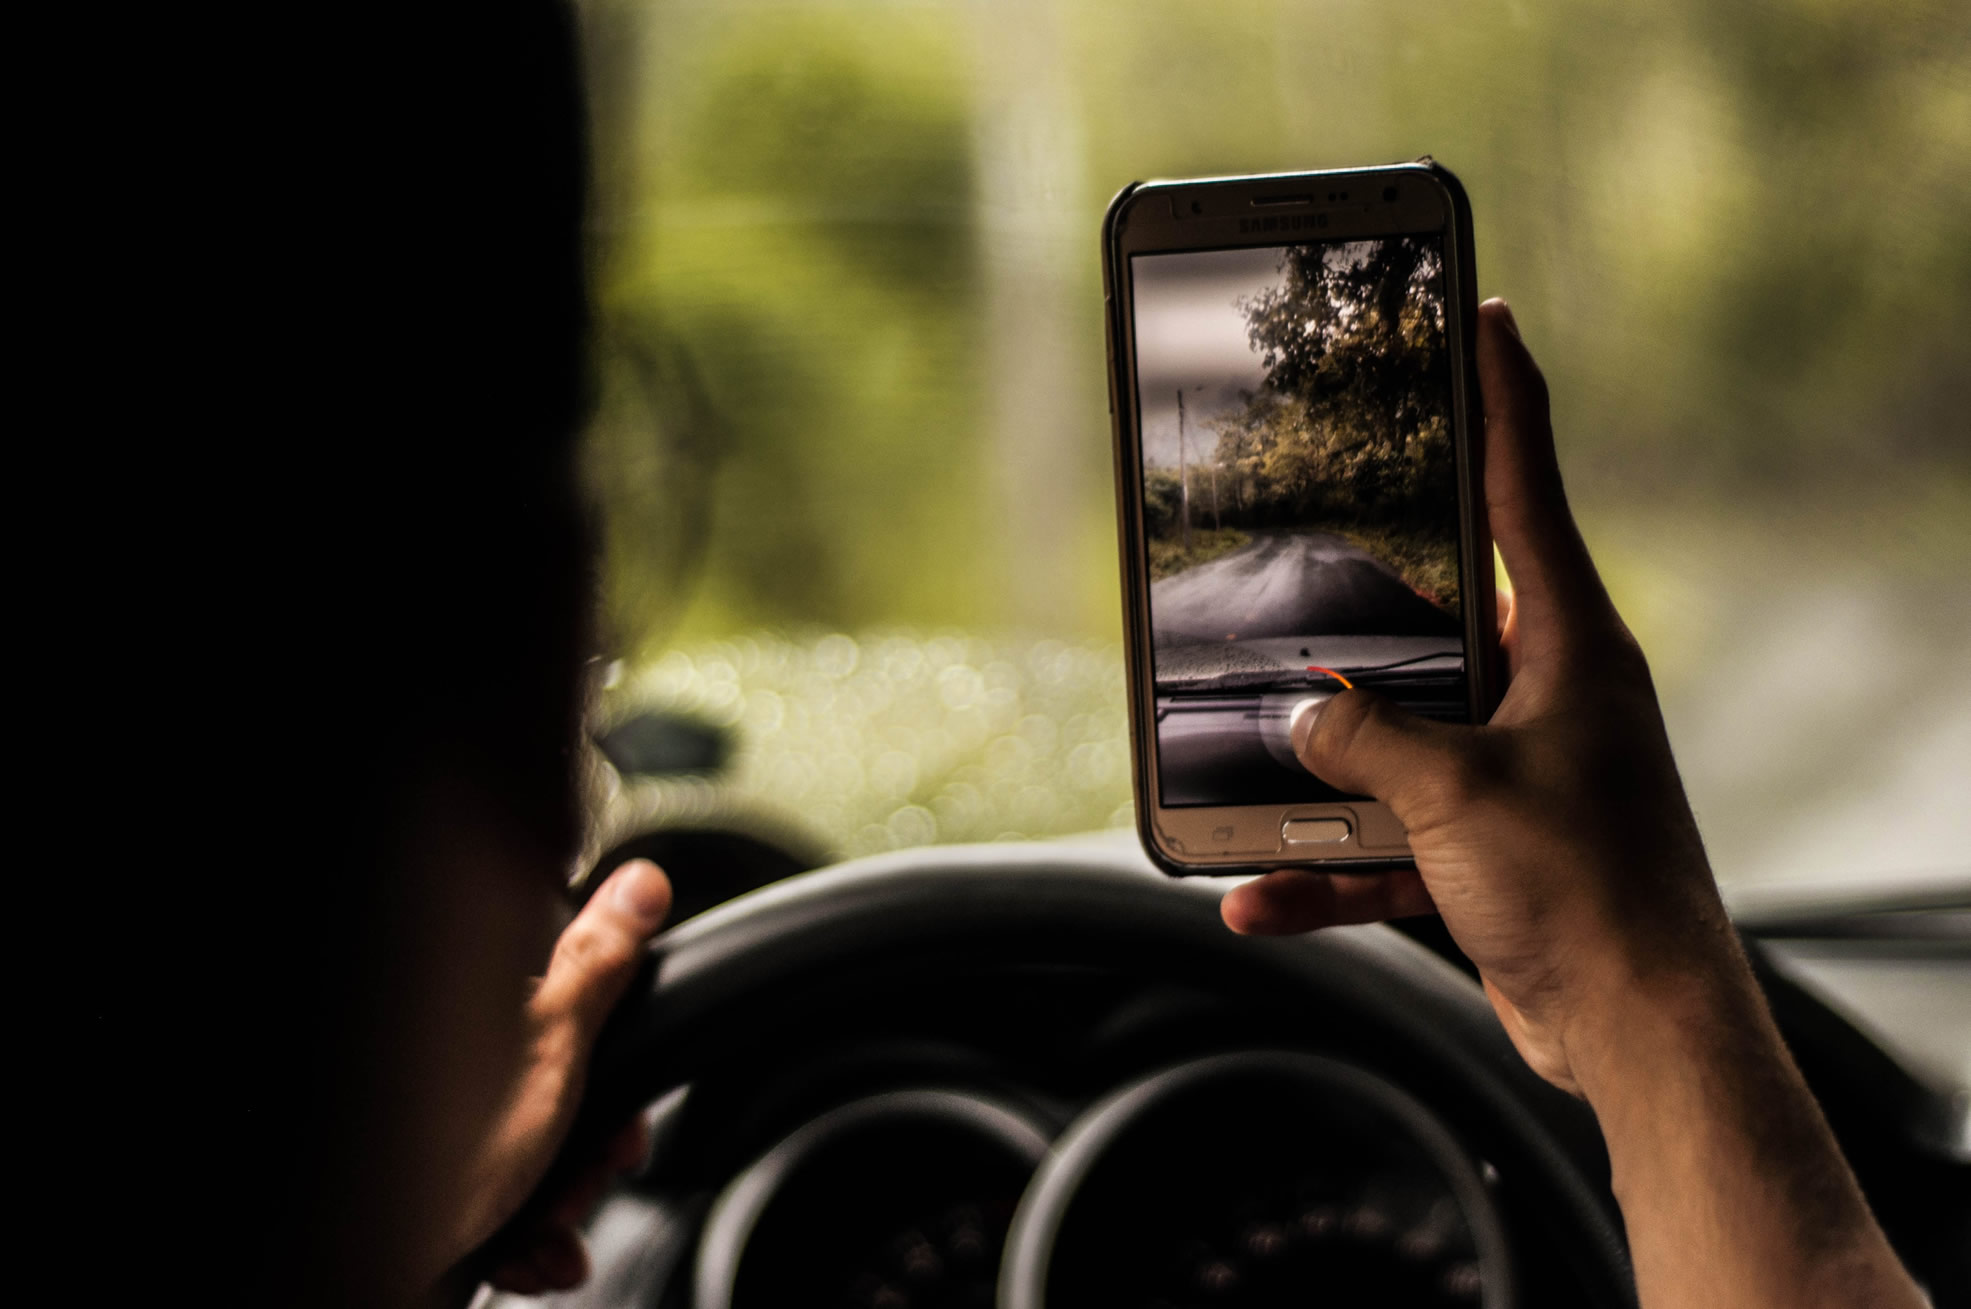 ¿Eres adicta a tu teléfono móvil?